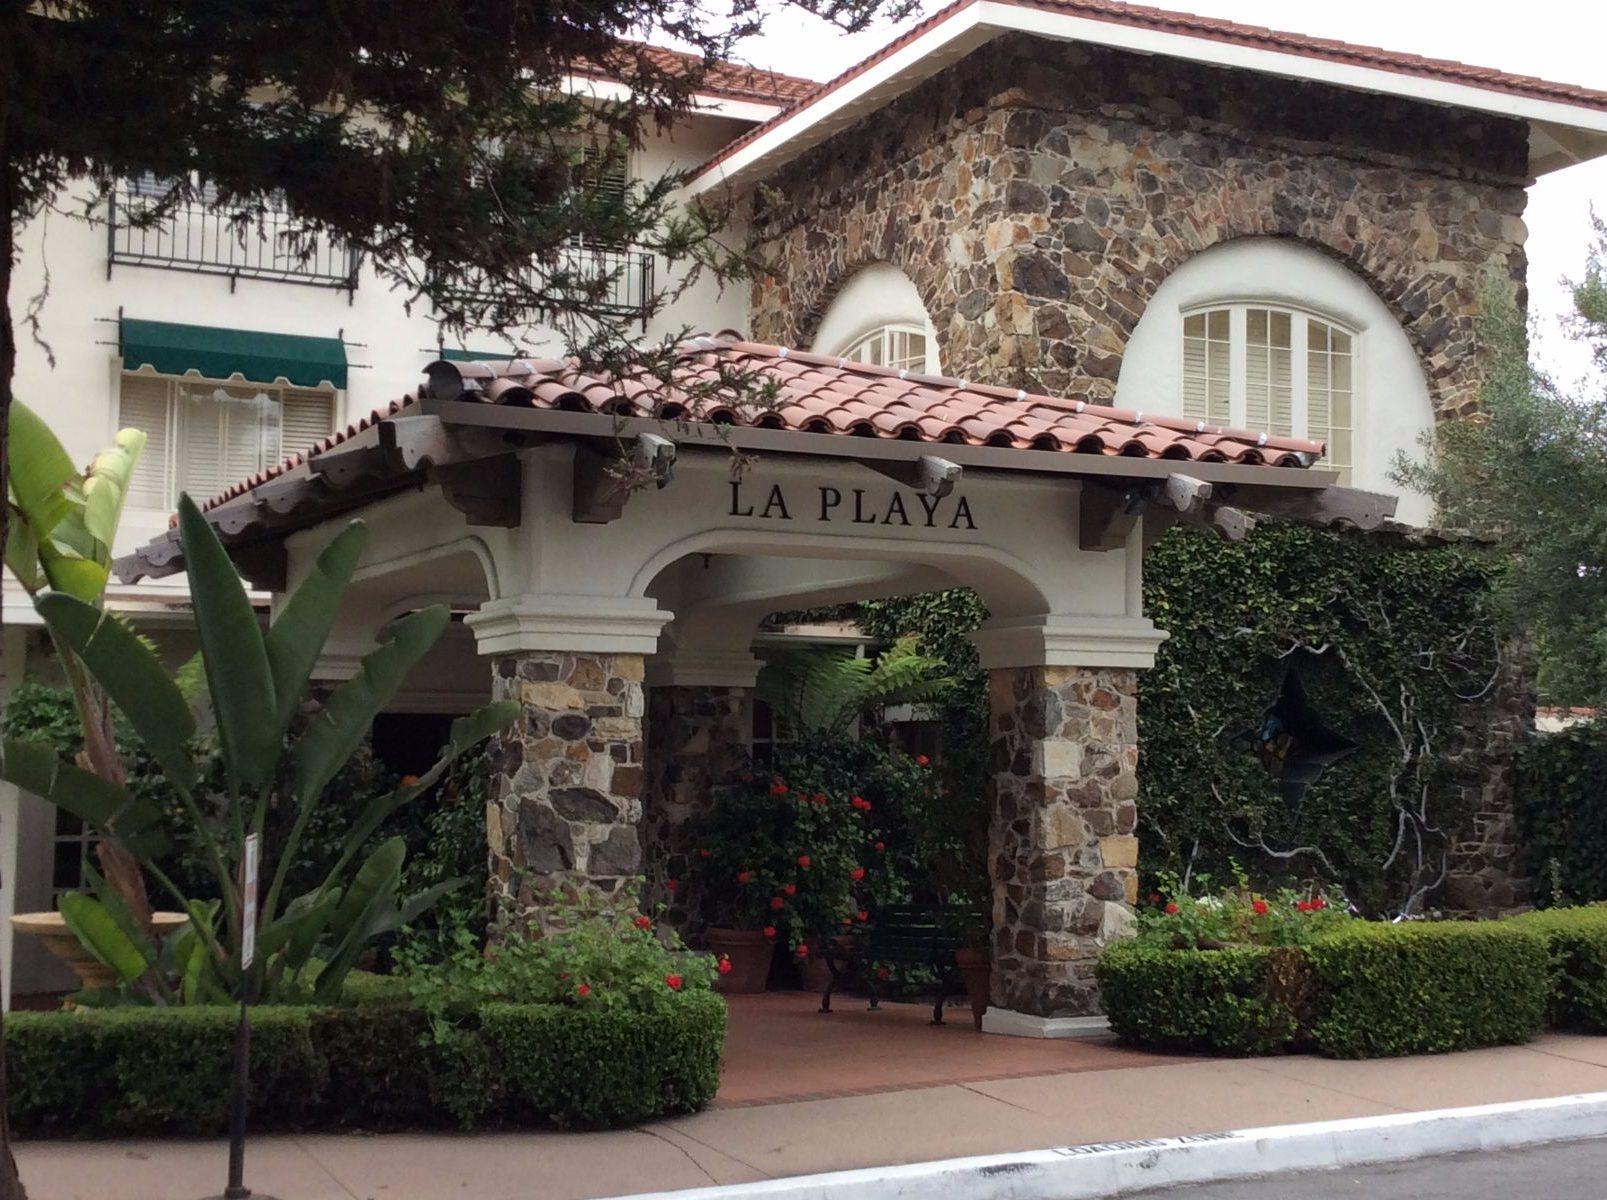 La Playa Carmel Hotel Entrance